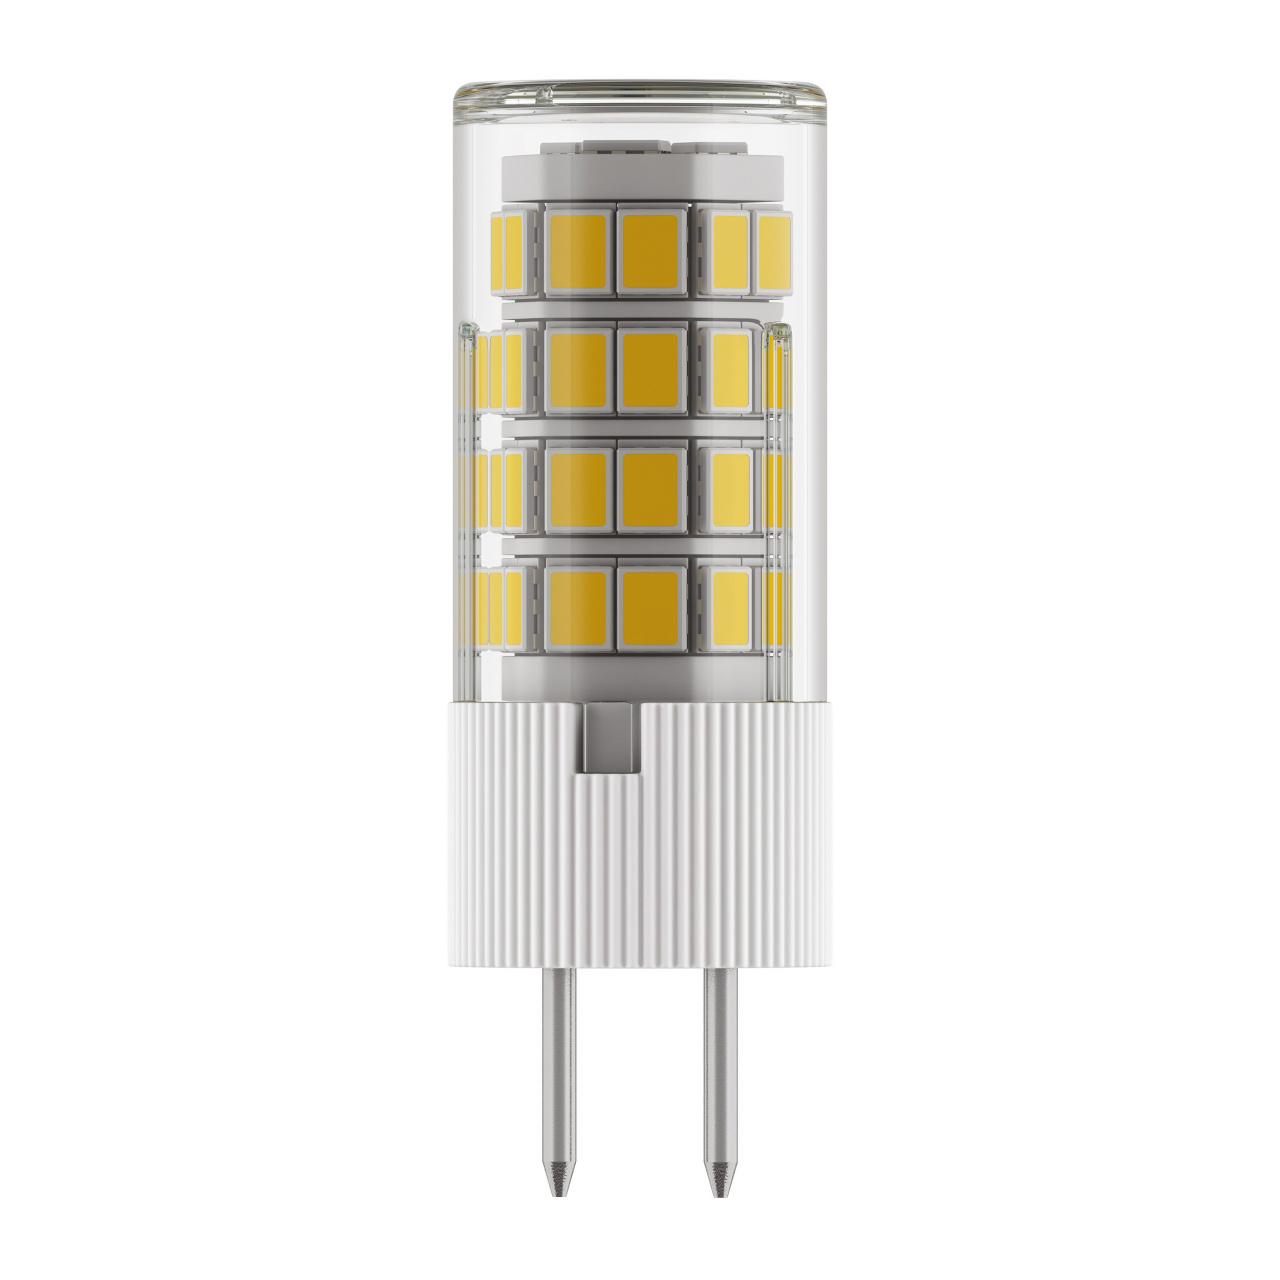 Лампа LED 220V Т20 G5.3 6W=60W 492LM 360G CL 4000K 20000H Lightstar 940434